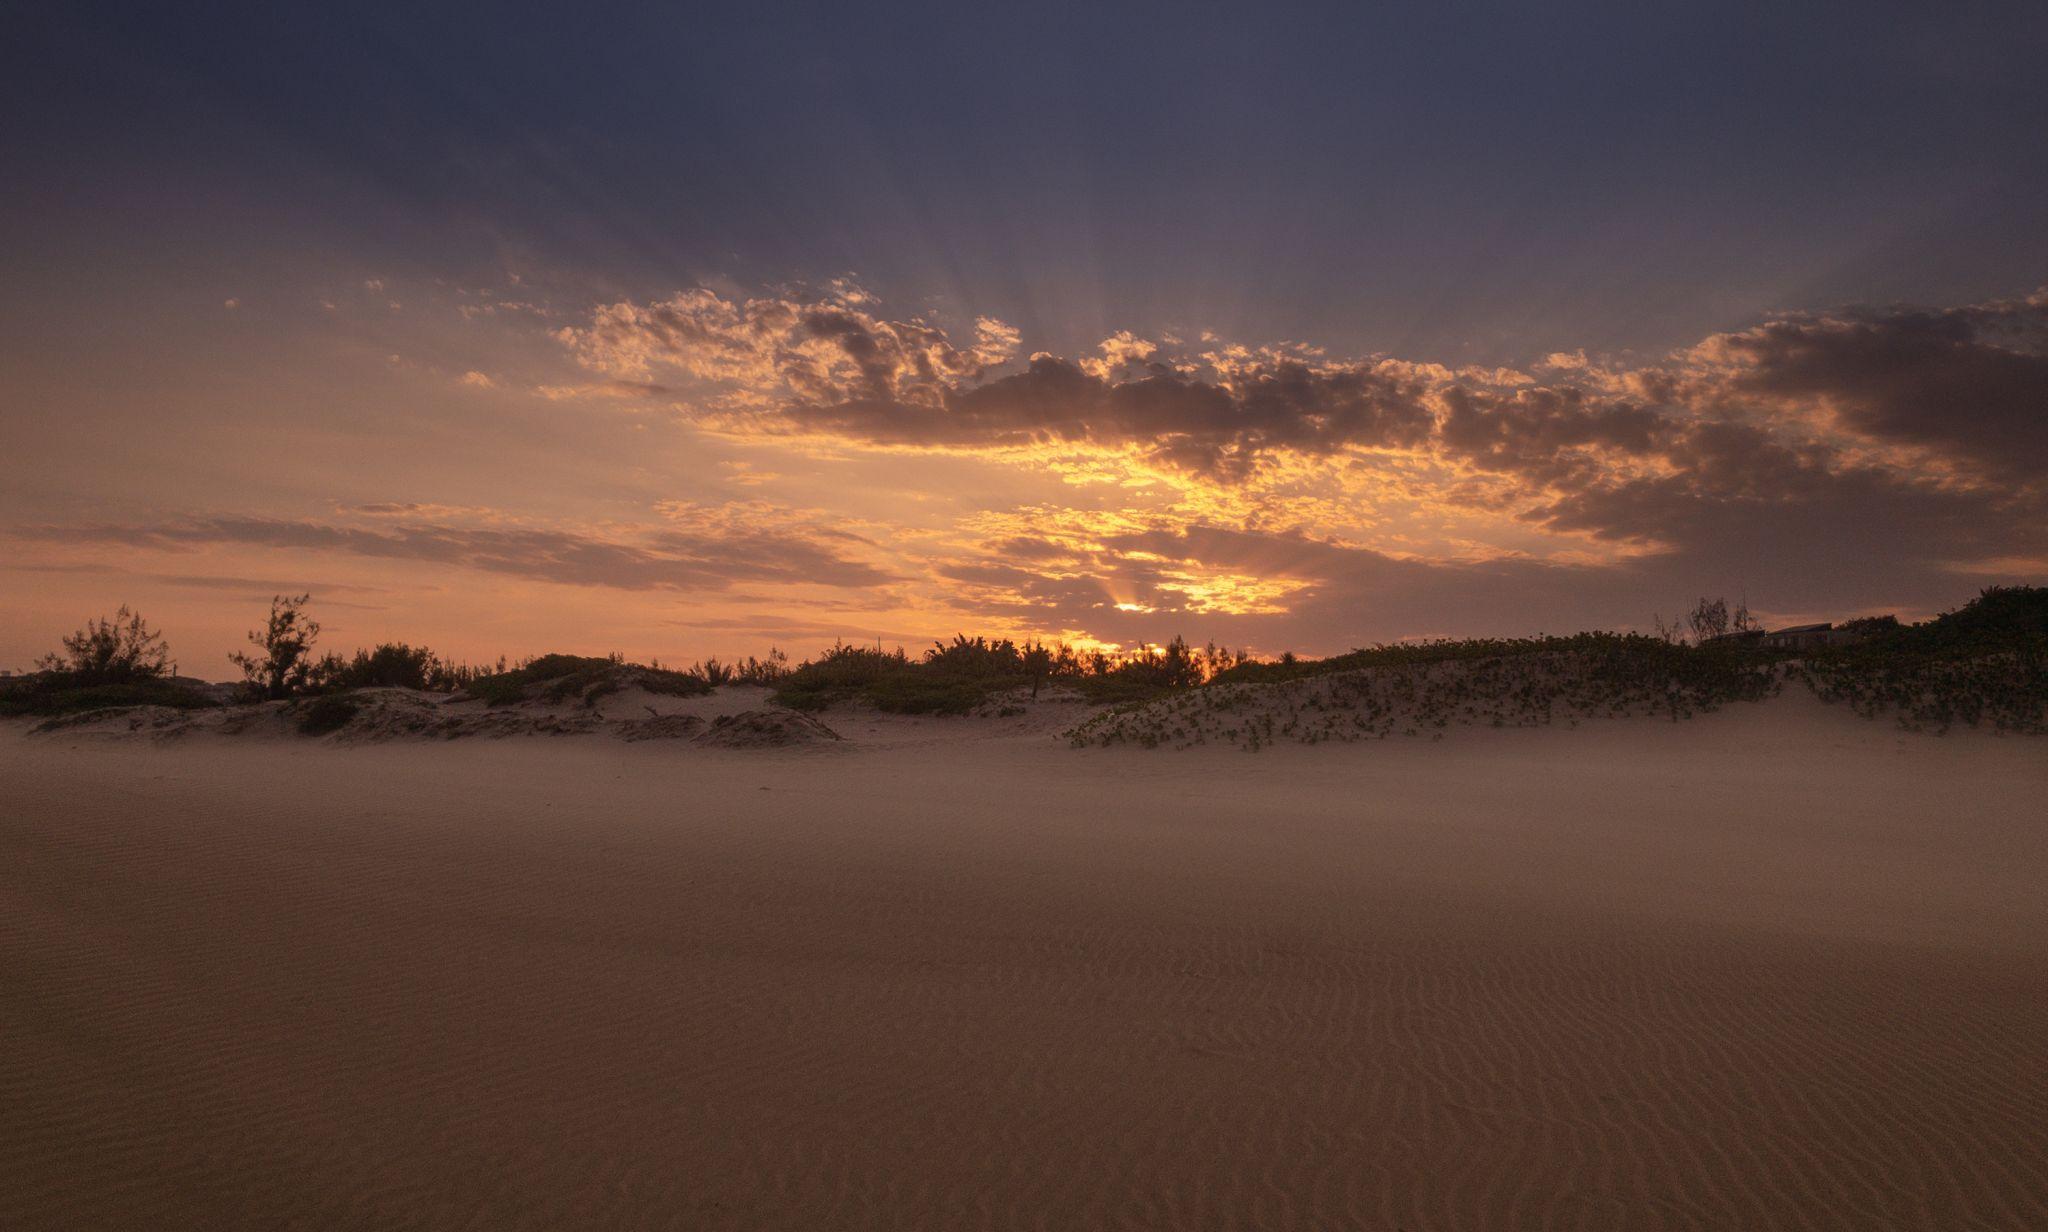 beach sunset, South Africa